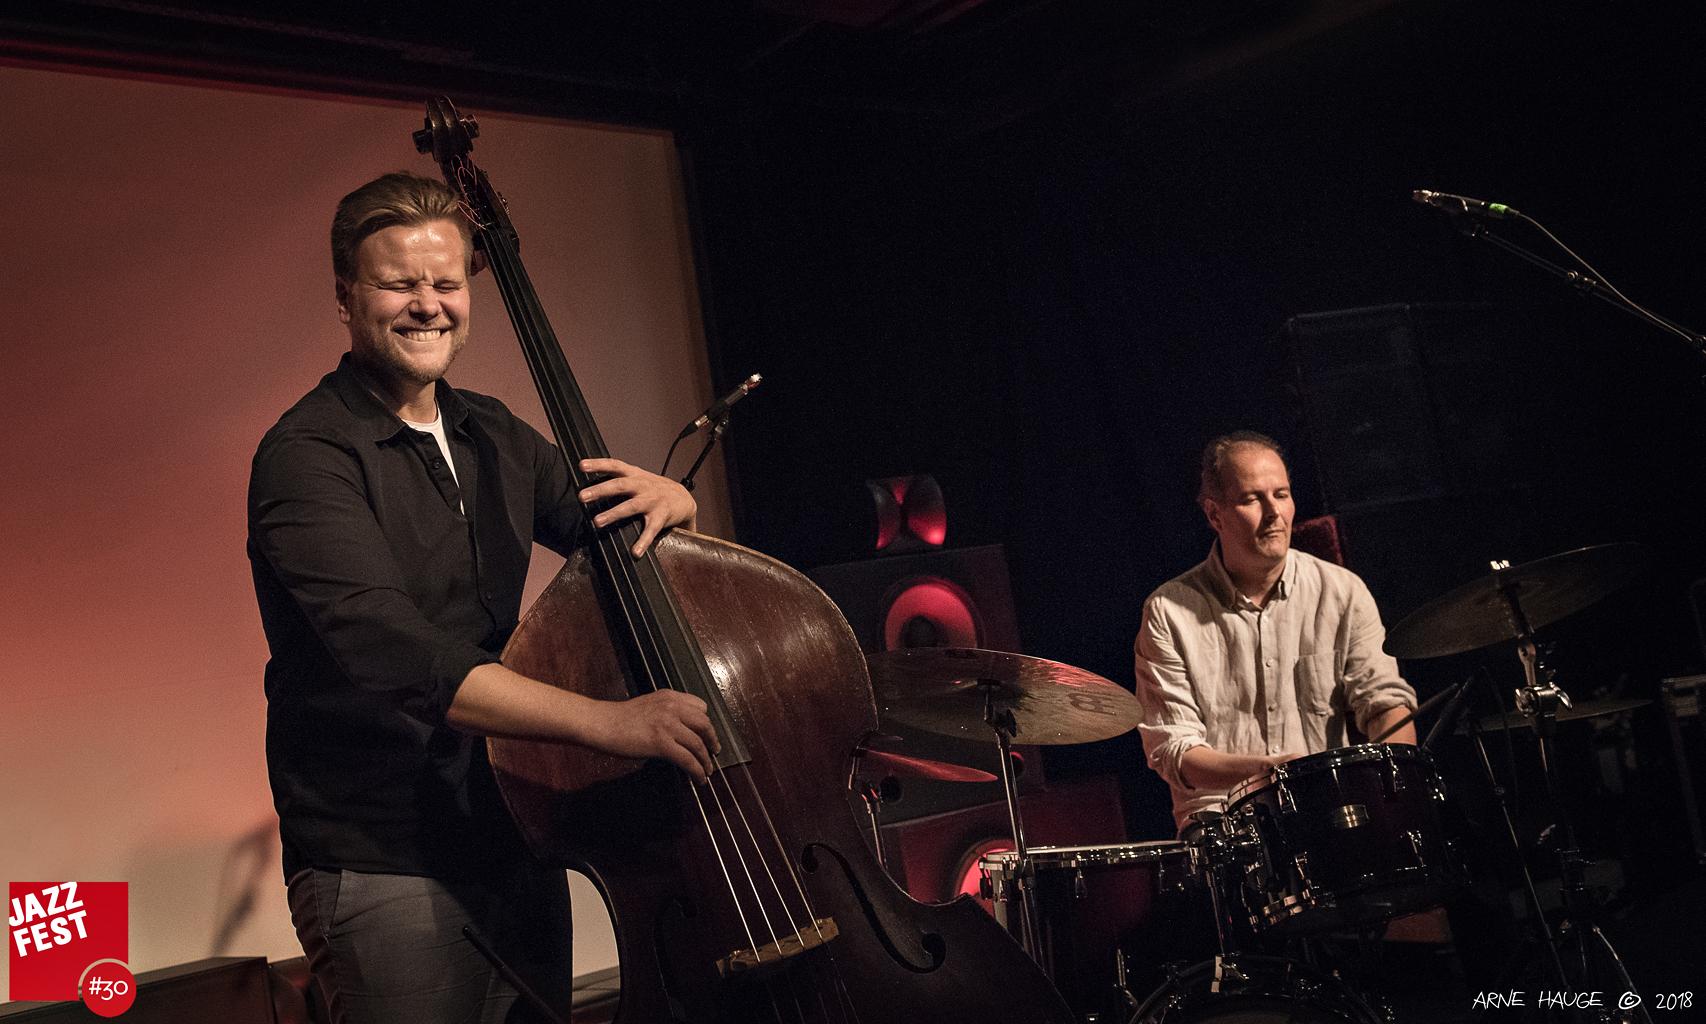 180511_Kari Ikonen Trio @ Cinemateket_003.jpg